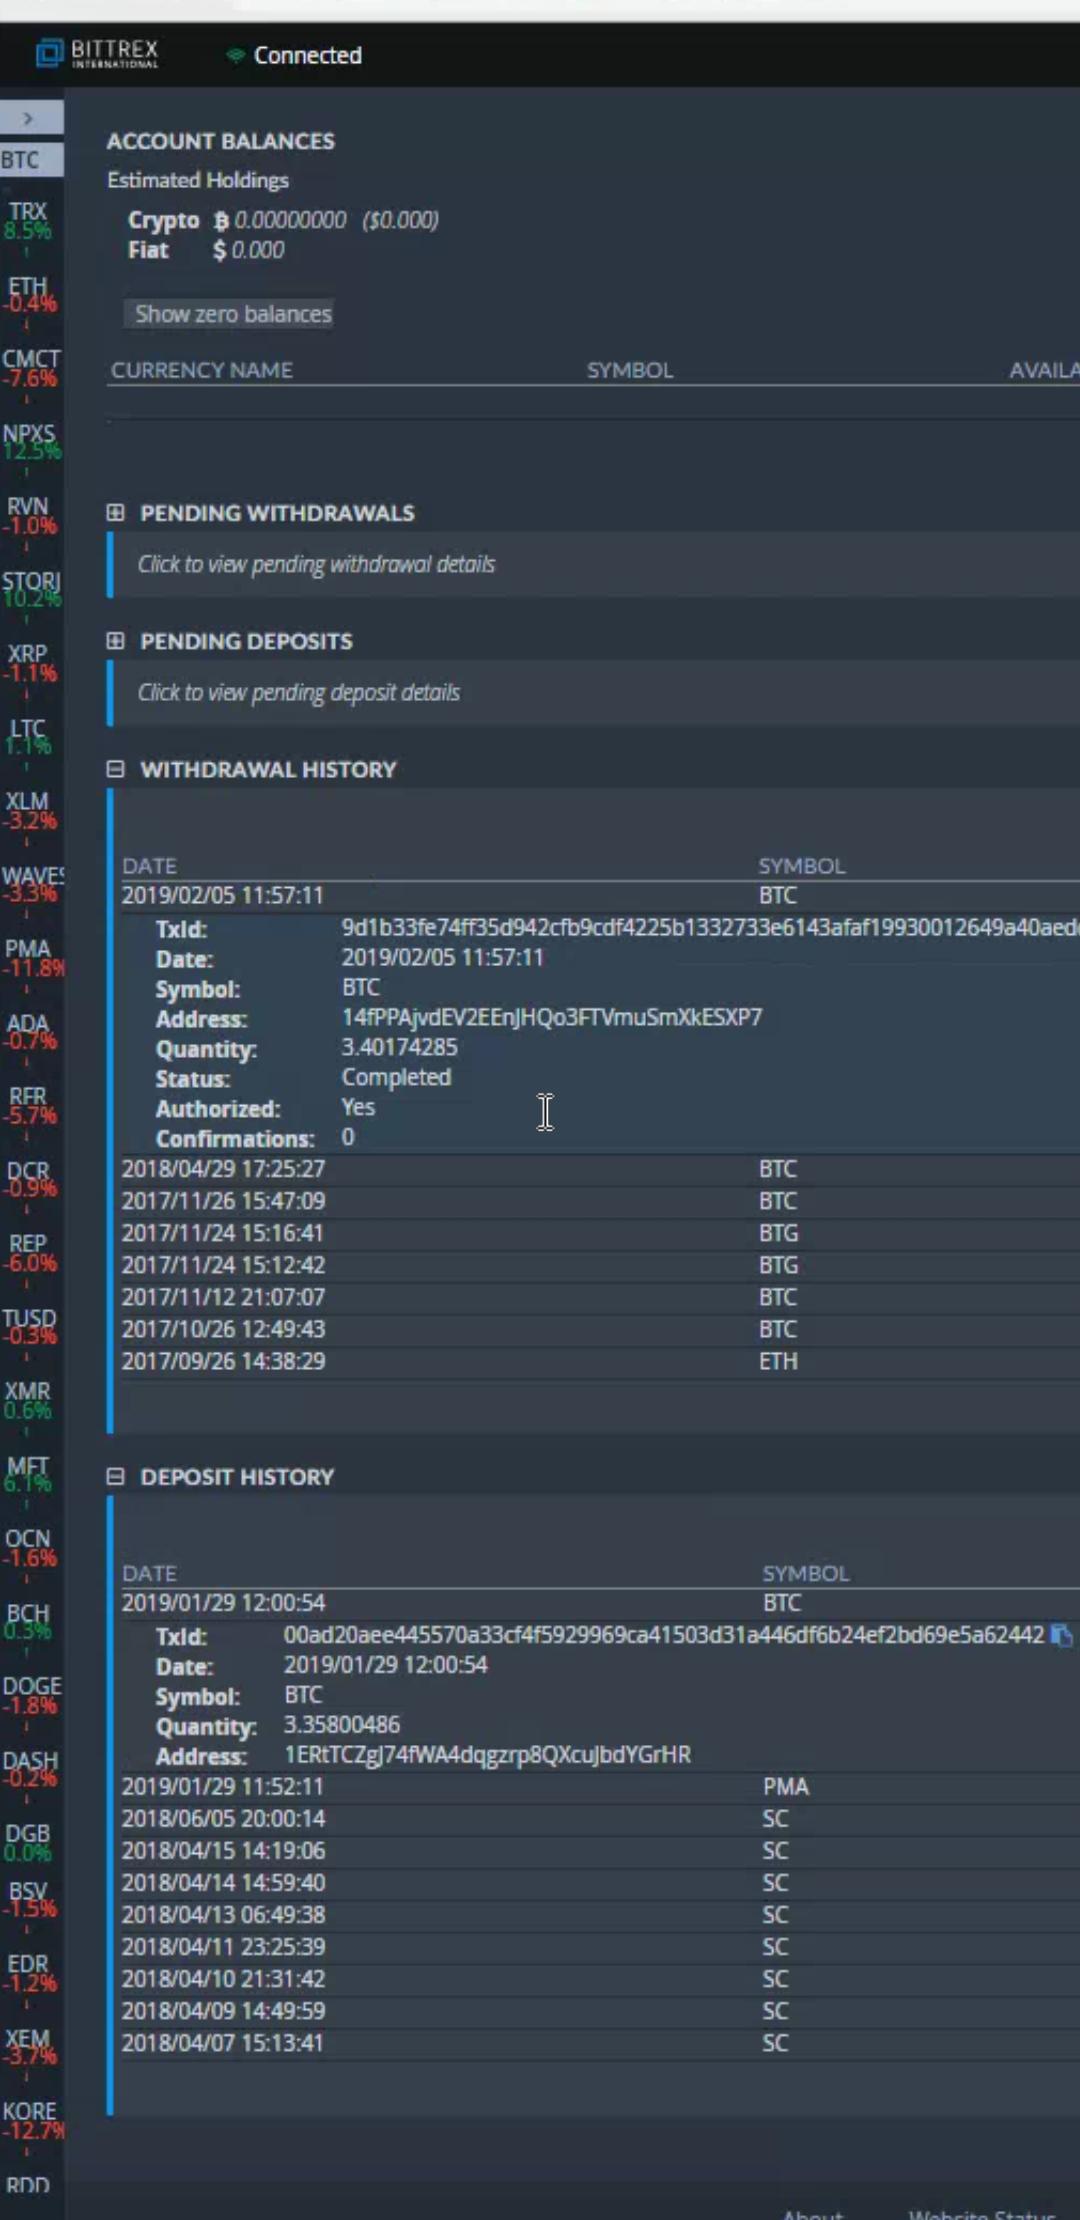 Screenshot_20190205-134121_Remote Desktop.jpg